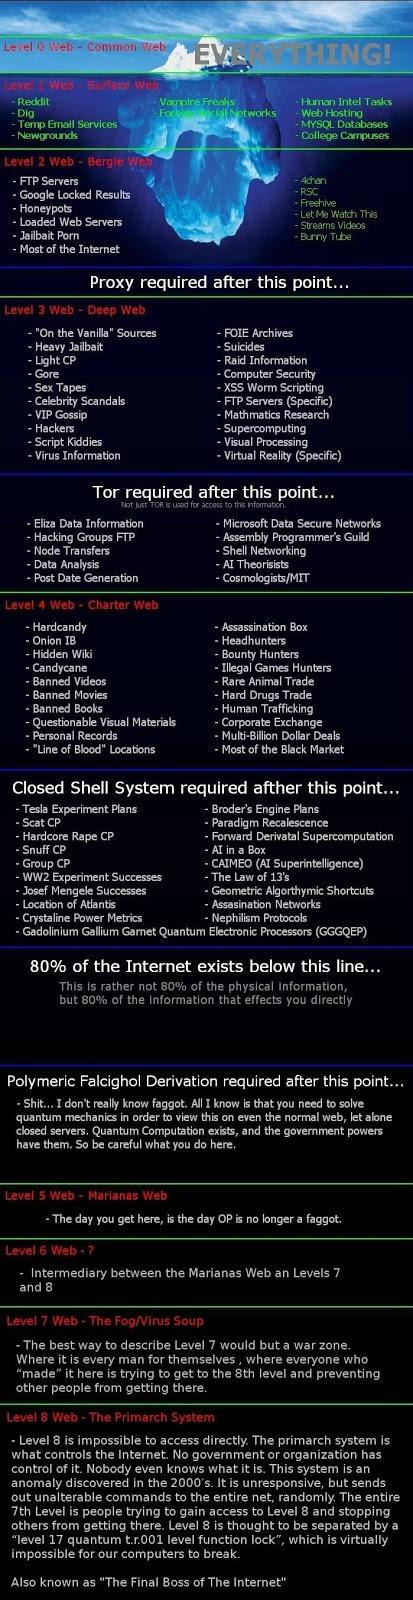 Los 8 niveles de la Deep Web - Internet profunda